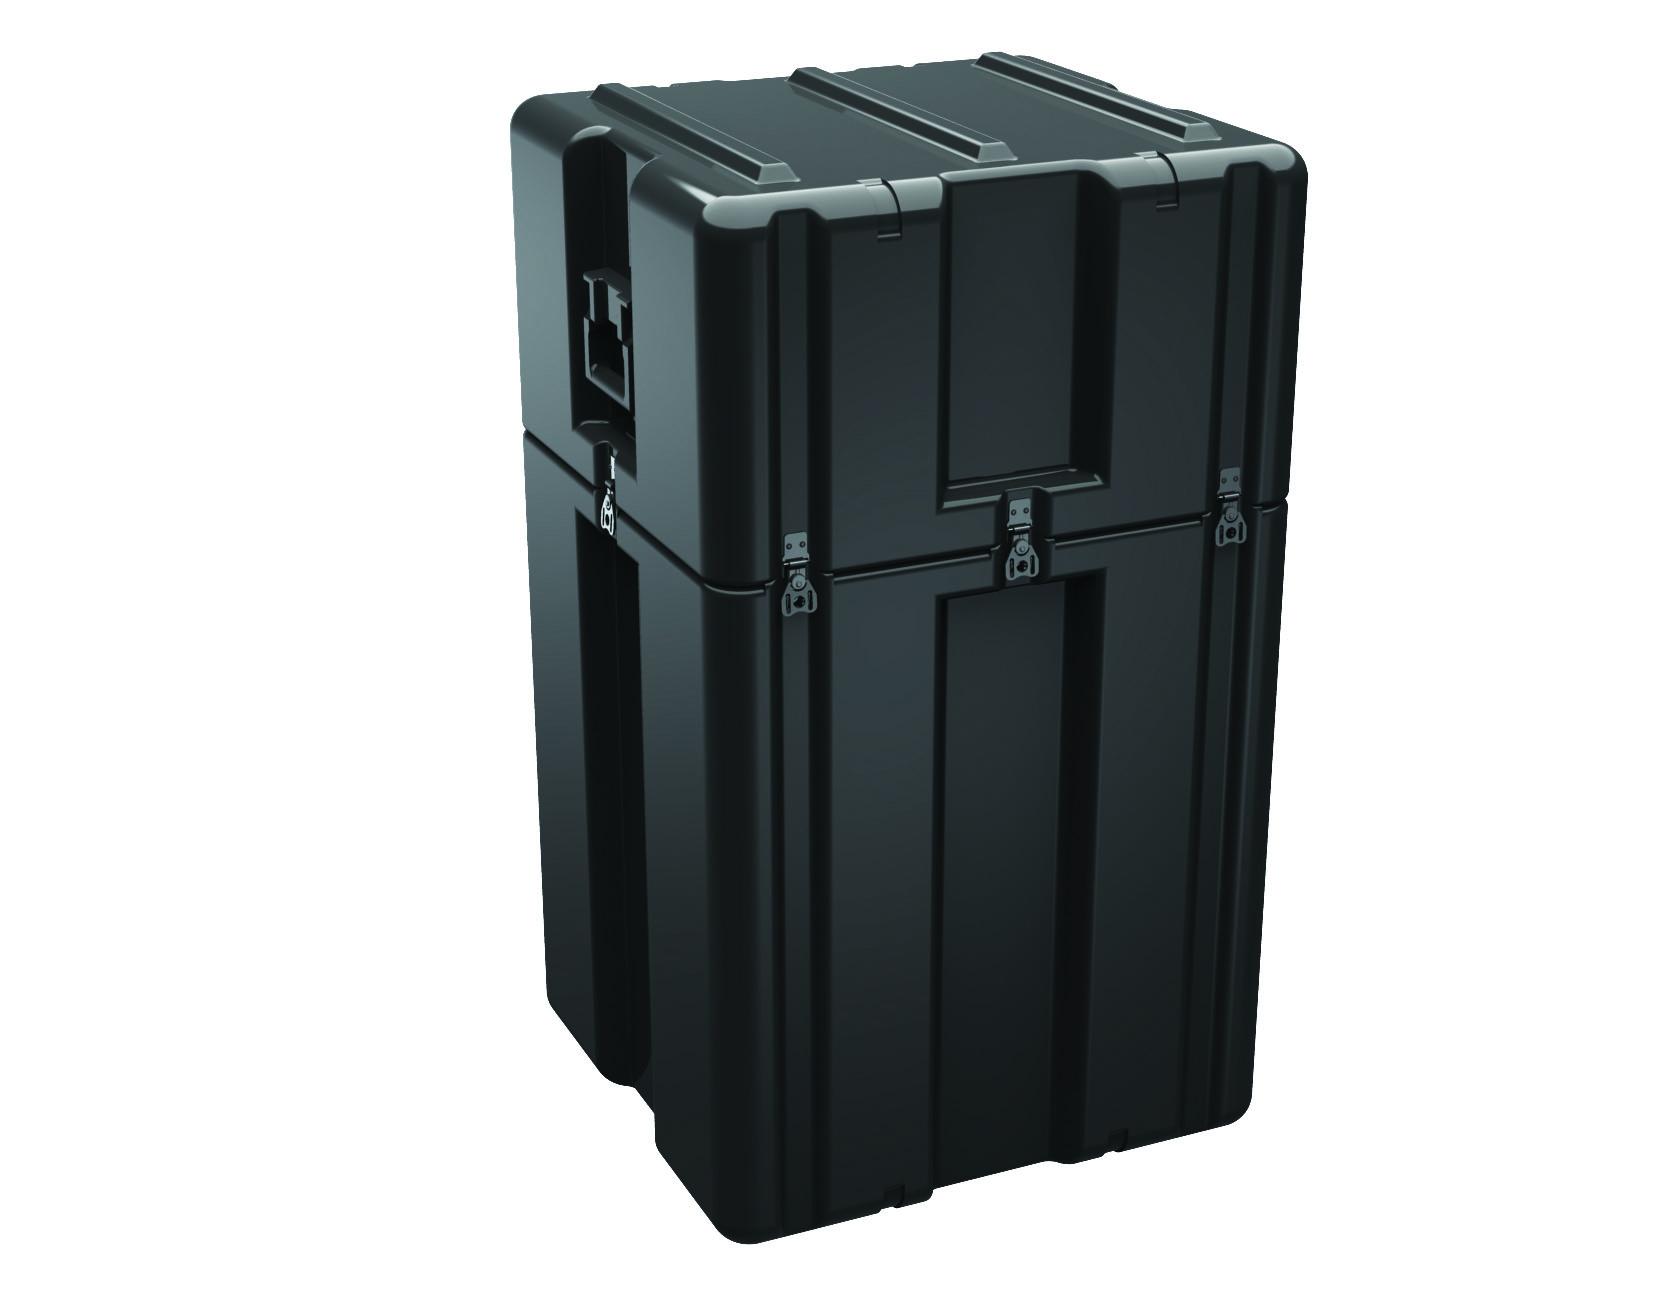 AL2221-2814 - AL2221-2814 Pelican Military Storage Container